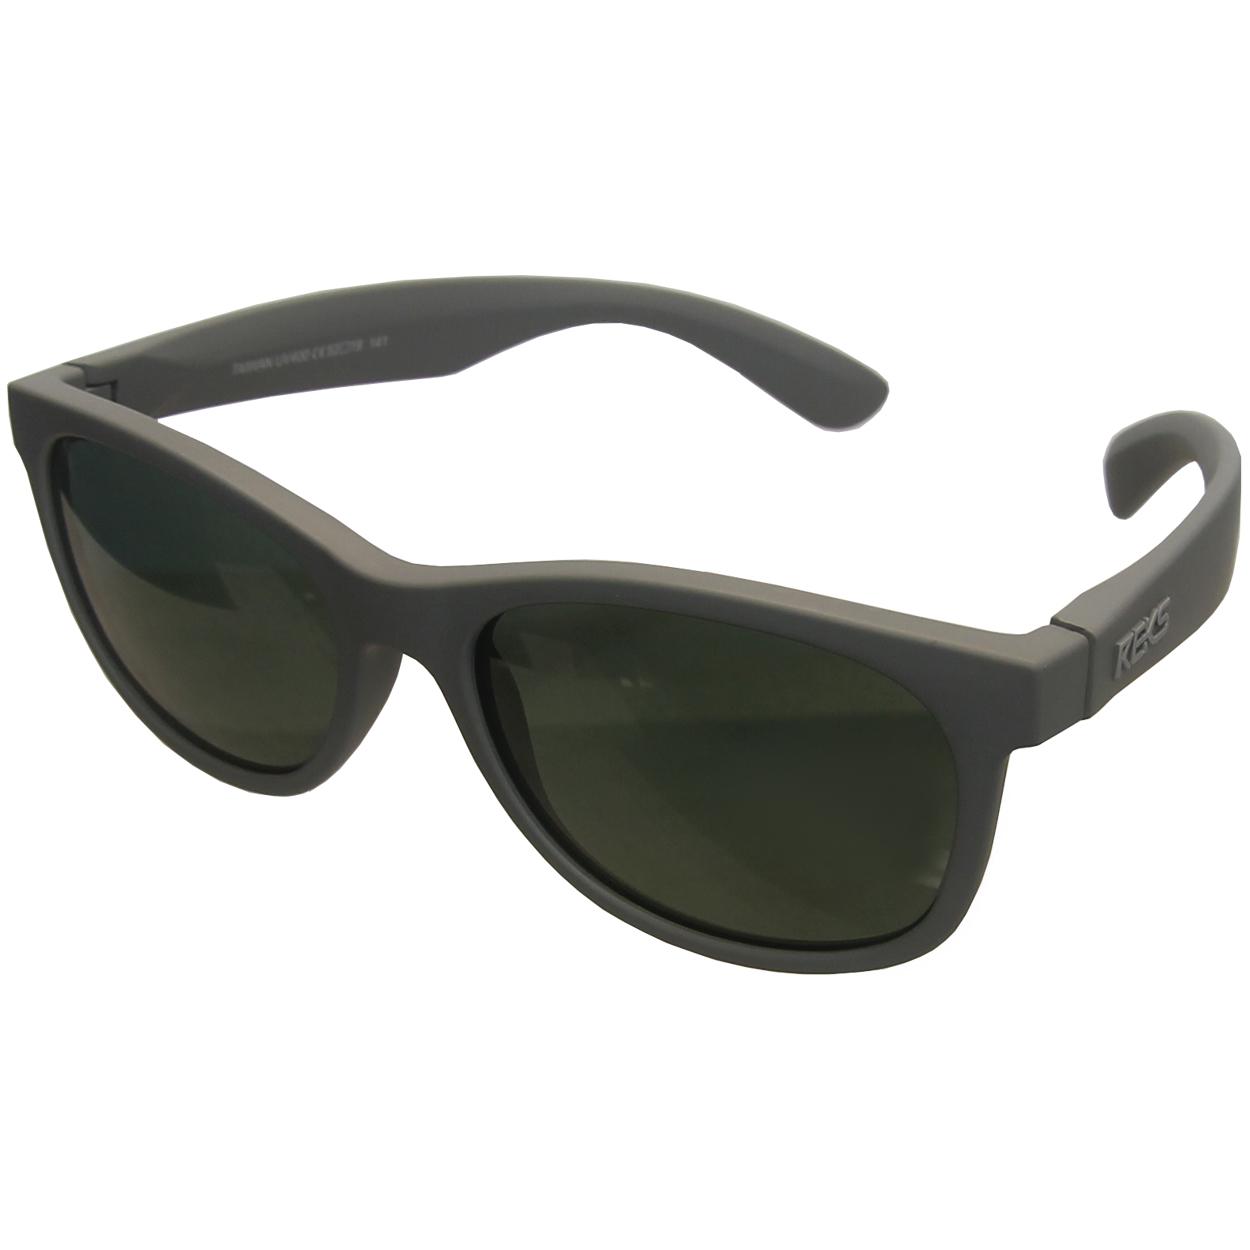 60ba11b8f5 Reks Optics Seafarer Polarized Golf Sunglasses